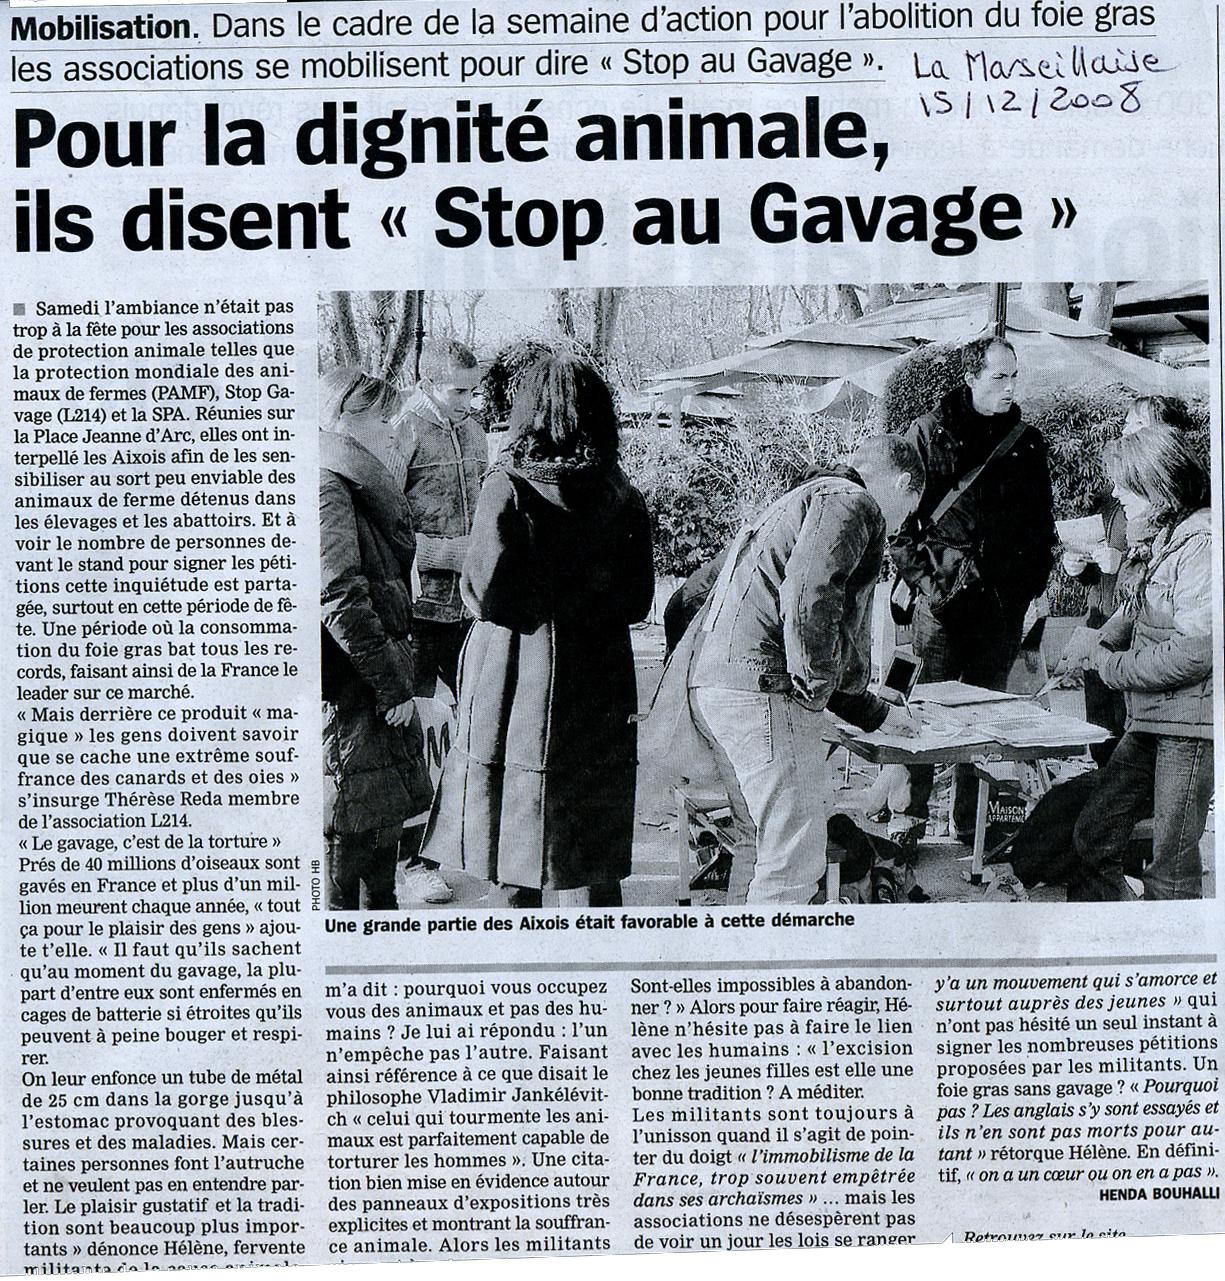 https://visuels.l214.com/sites/blog.l214.com/dotclear/aix-foie-gras-la-marseillaise.jpg